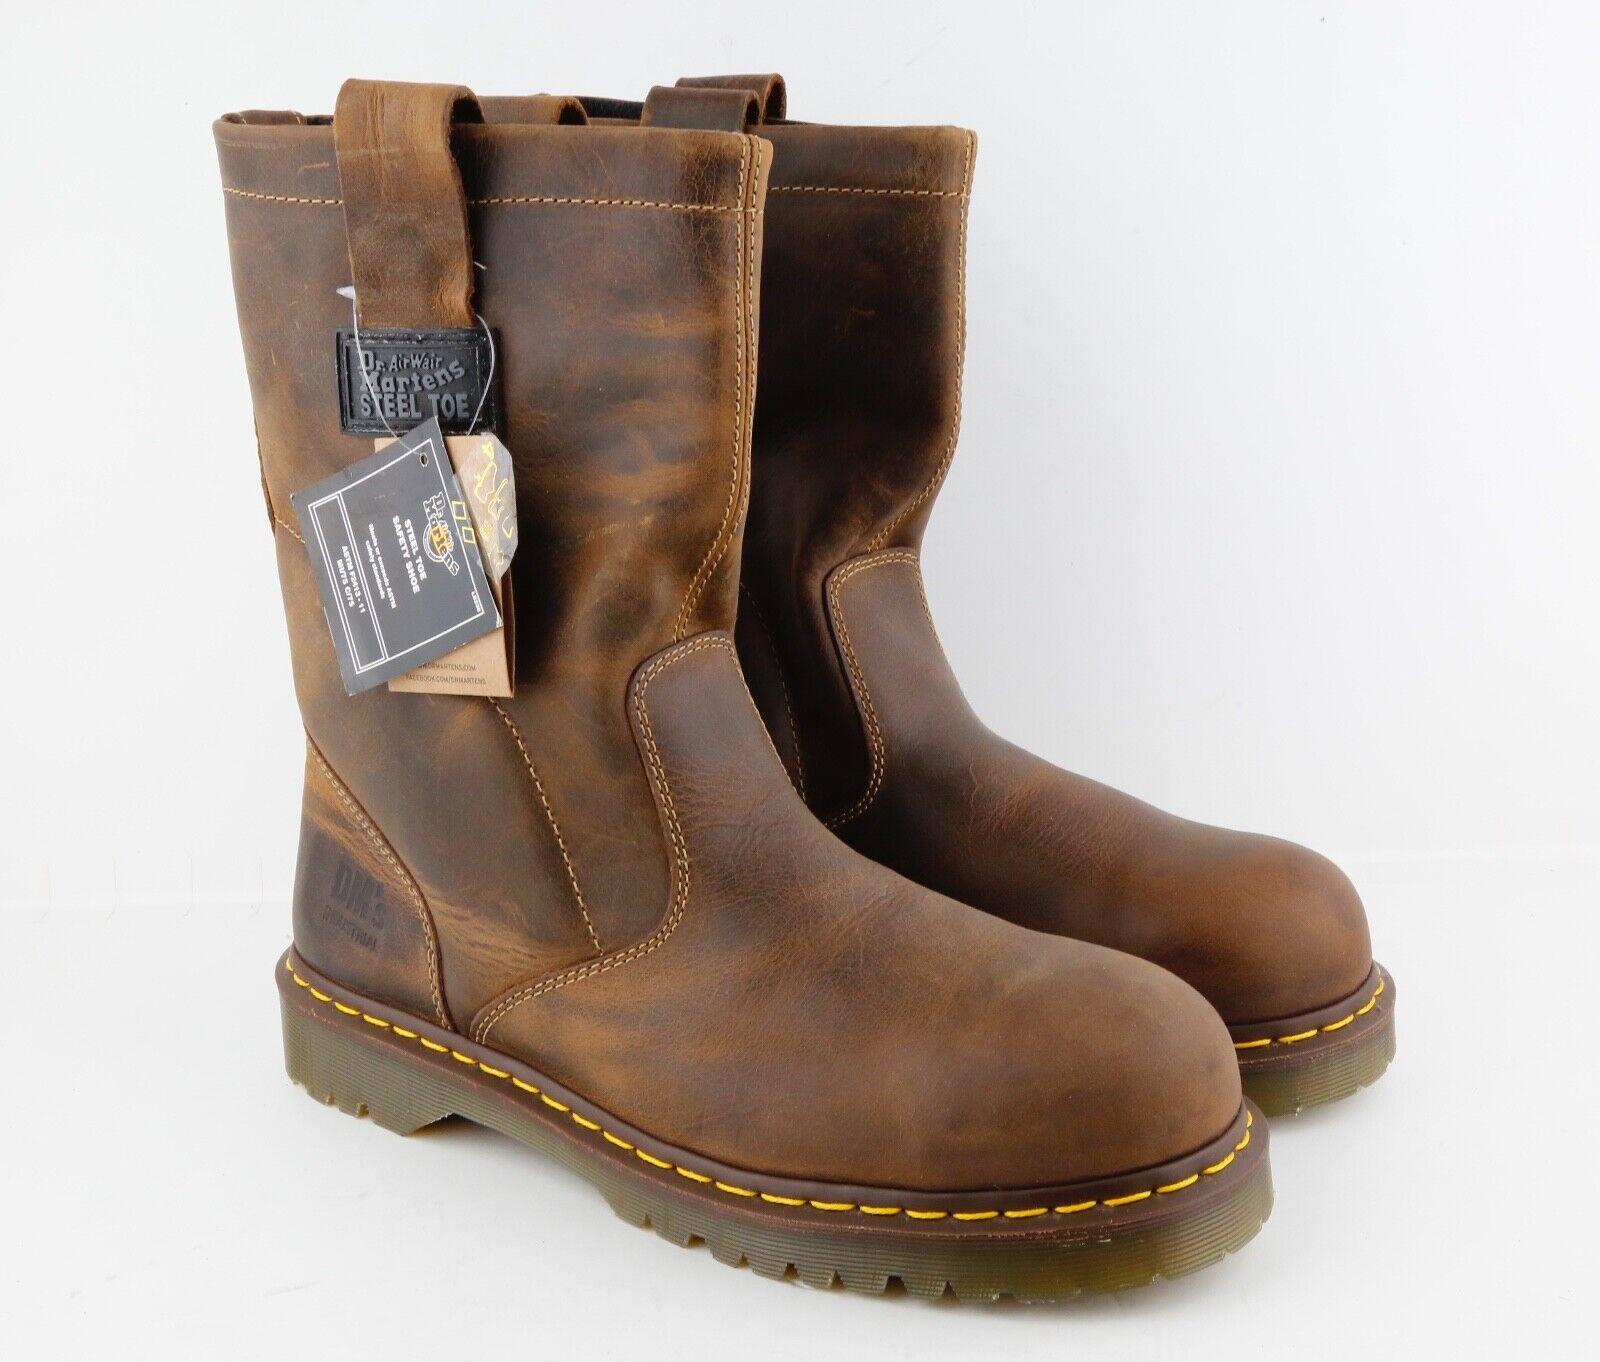 Dr.Martens R10294 Men's 2295 Industrial Boots tan Size 5 F U